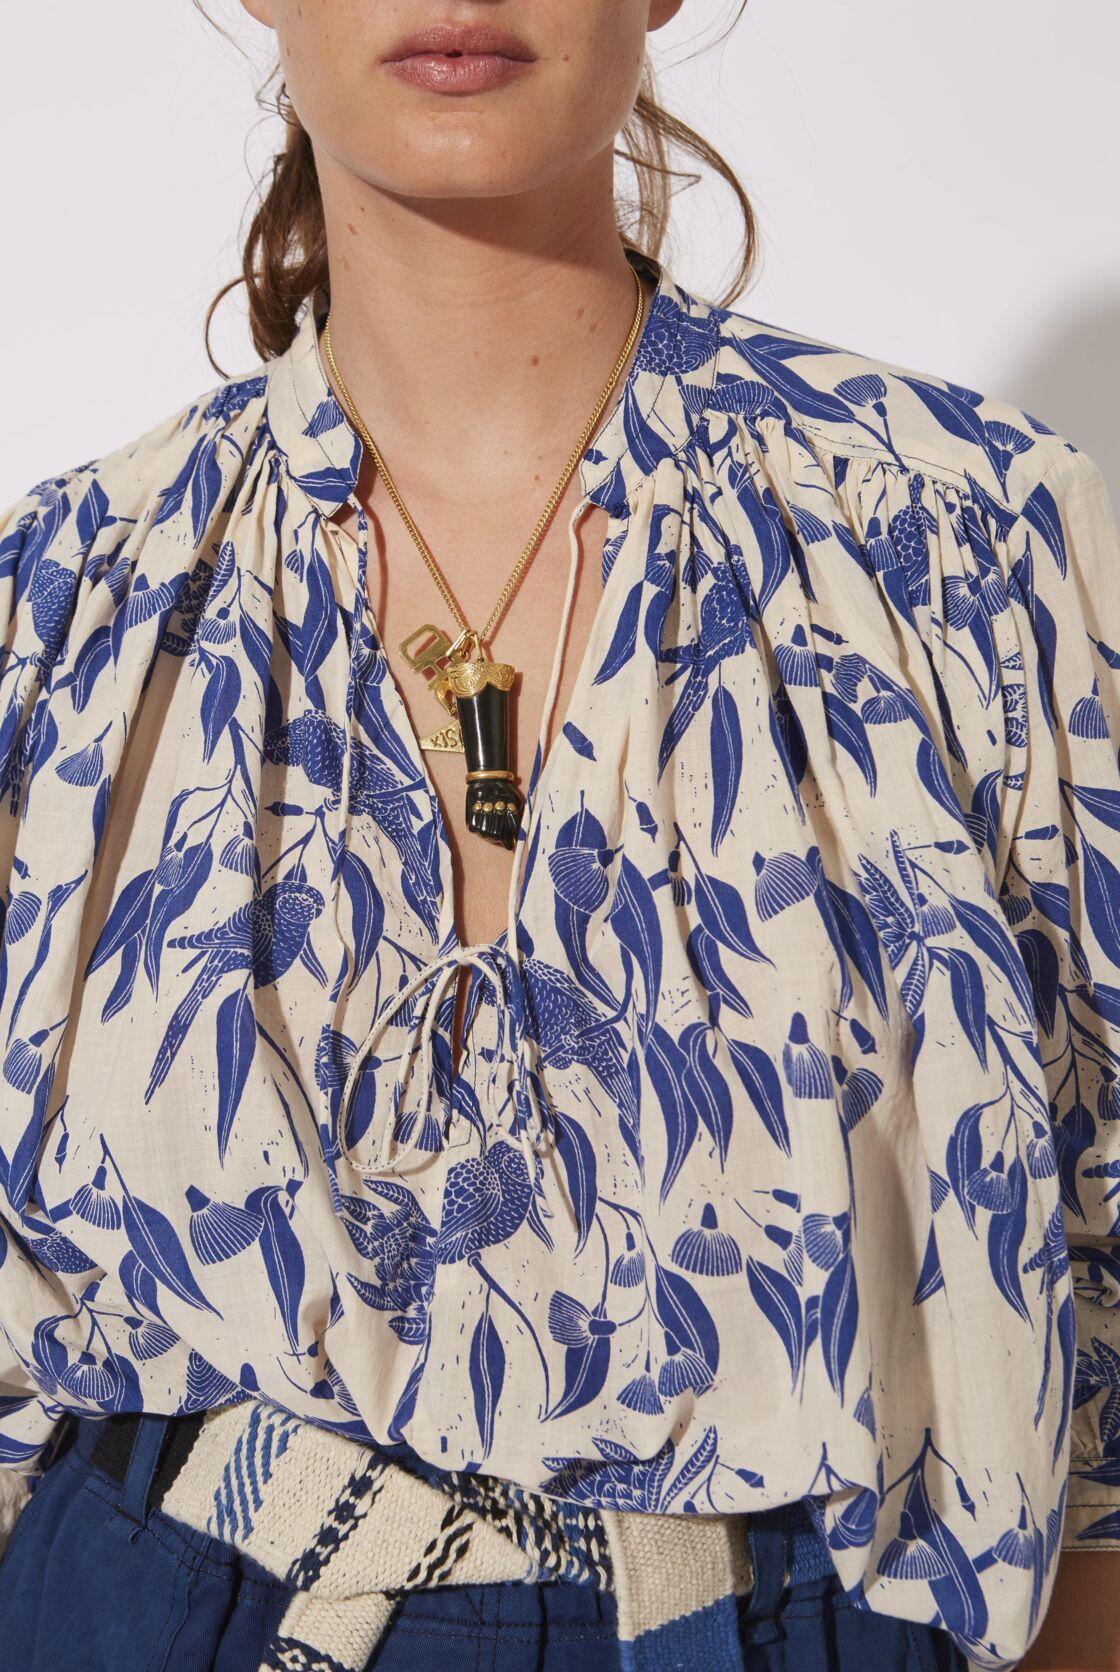 Laurence bras, la blouse luxueuse en teinture naturelle